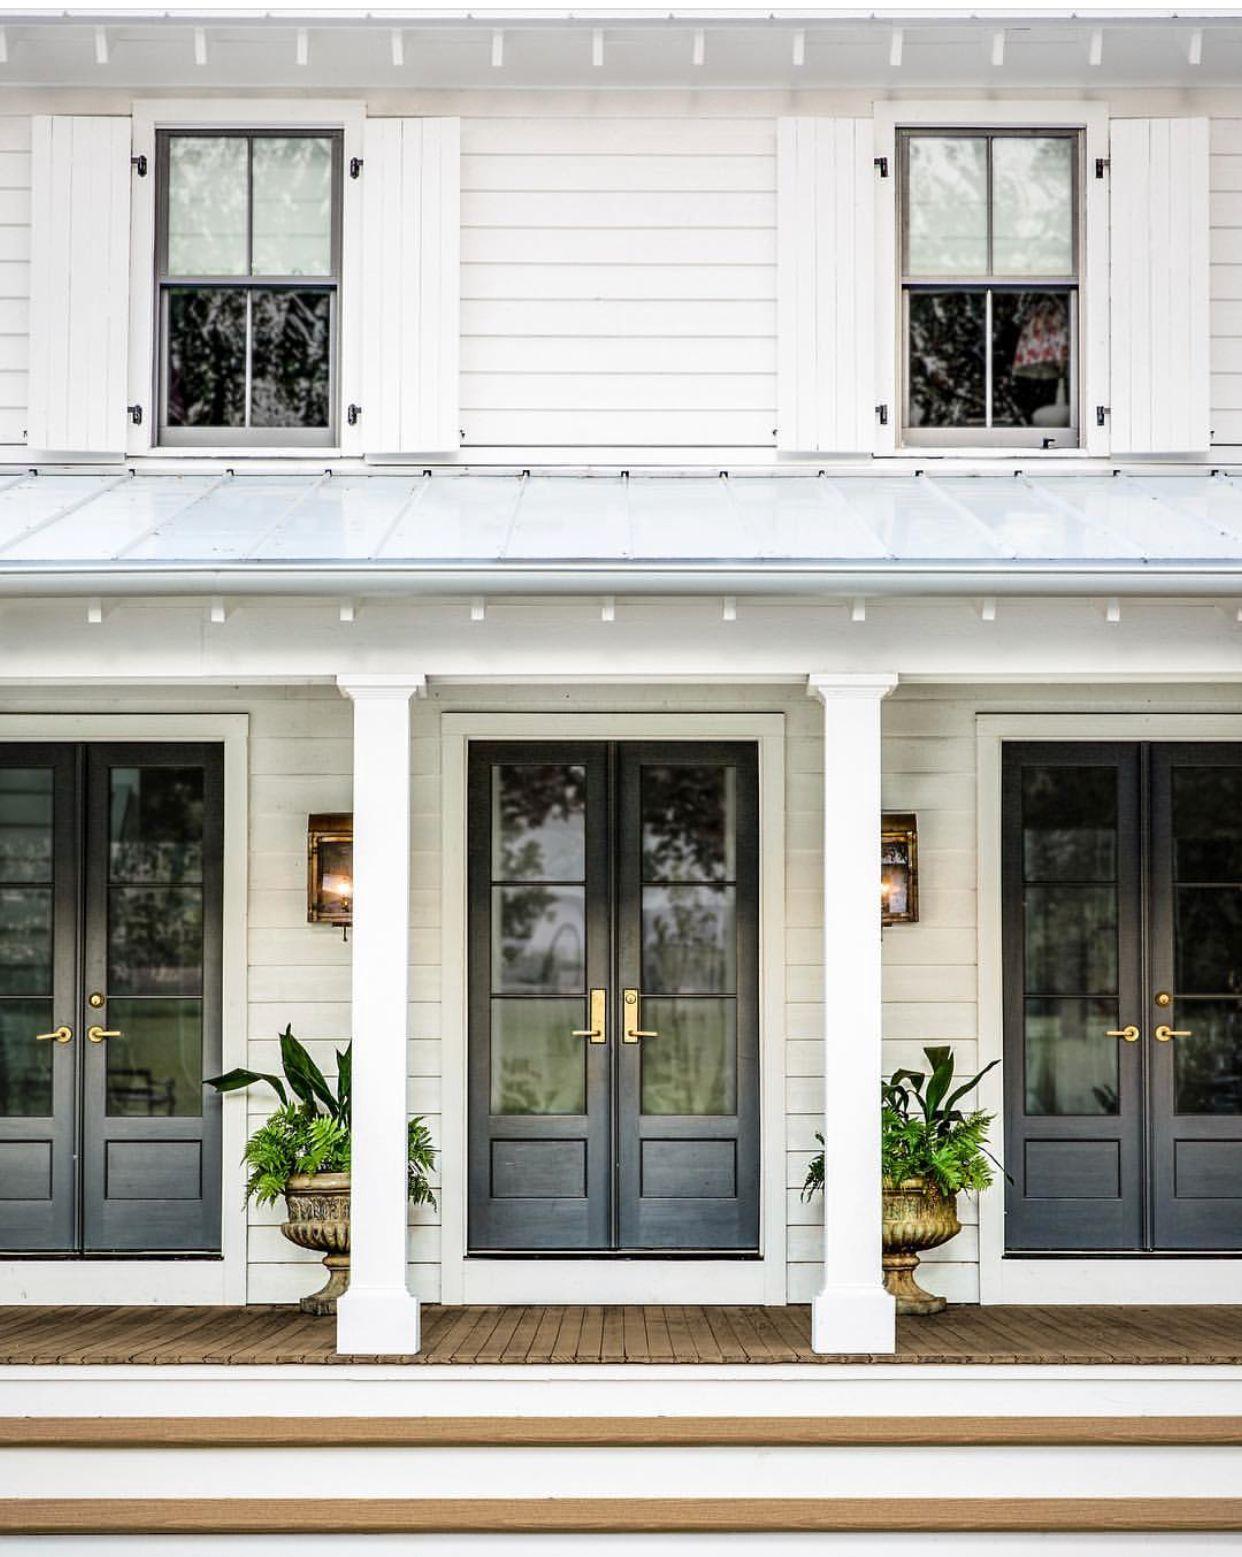 Exterior modern siding window design  pin by little glass jar on house exteriors  pinterest  front